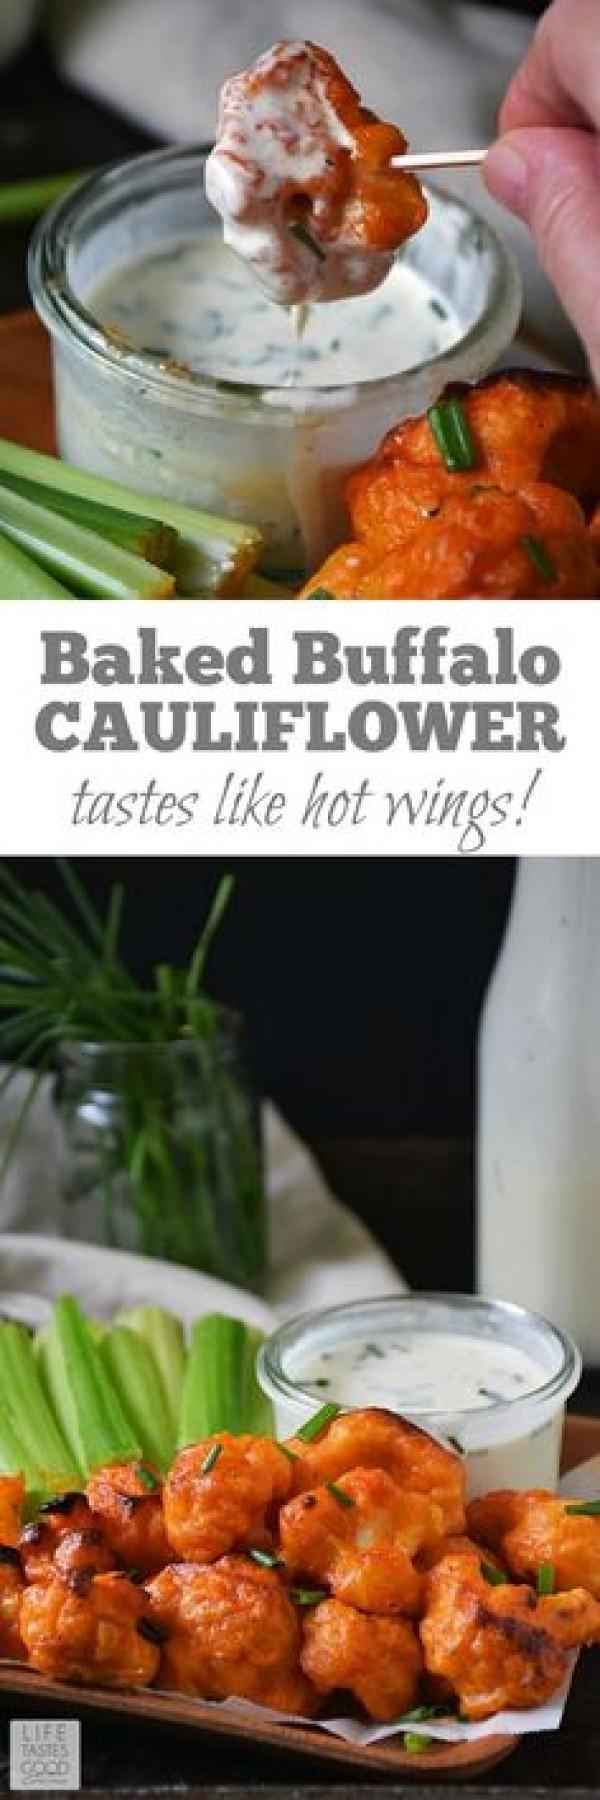 Get the recipe Baked Buffalo Cauliflower @recipes_to_go